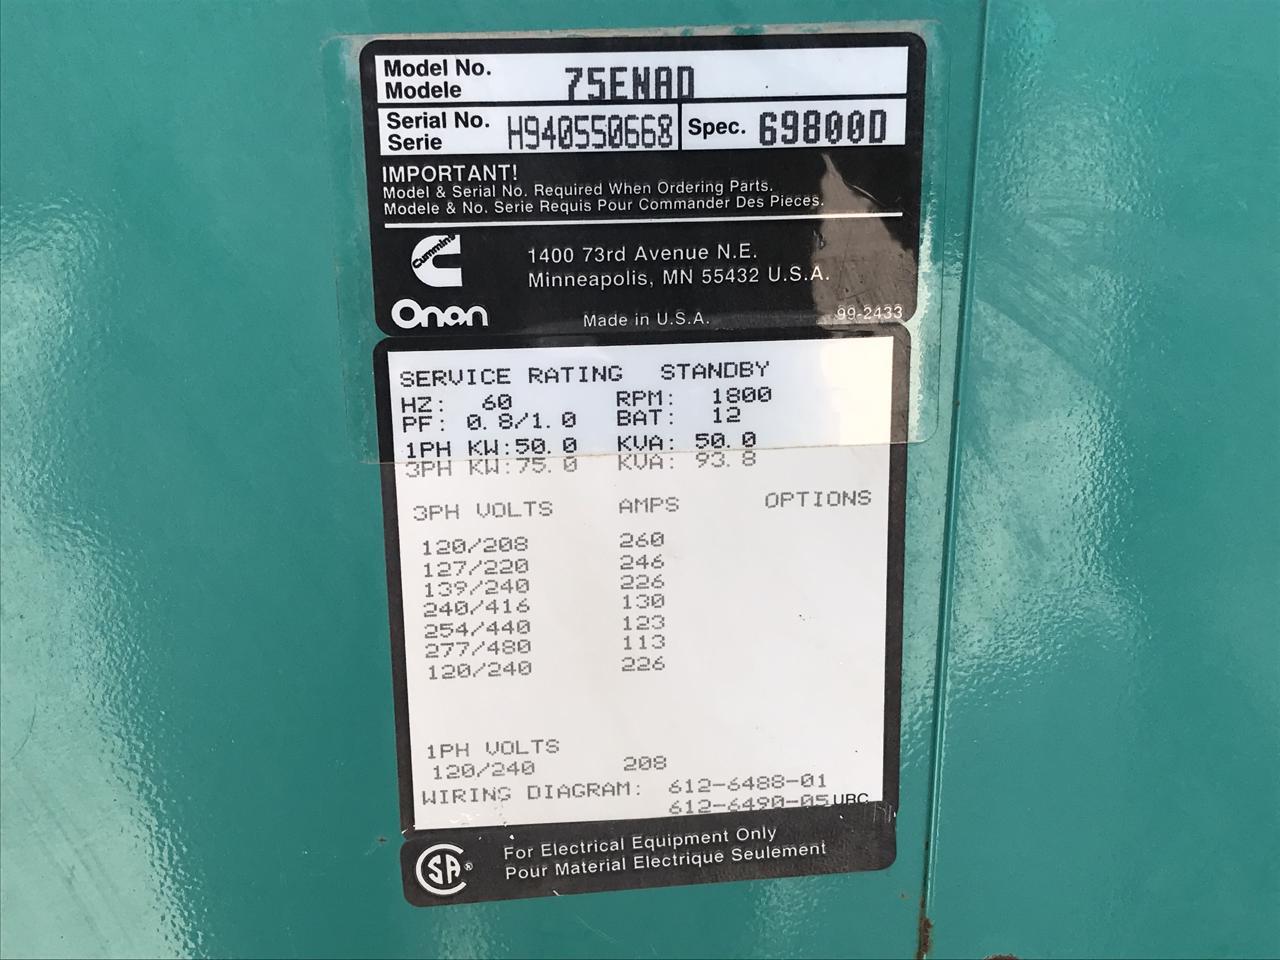 75 Kw Cummins Onan Generator Set 12 Lead Year 1994 Weather Proof 277 480 Volts